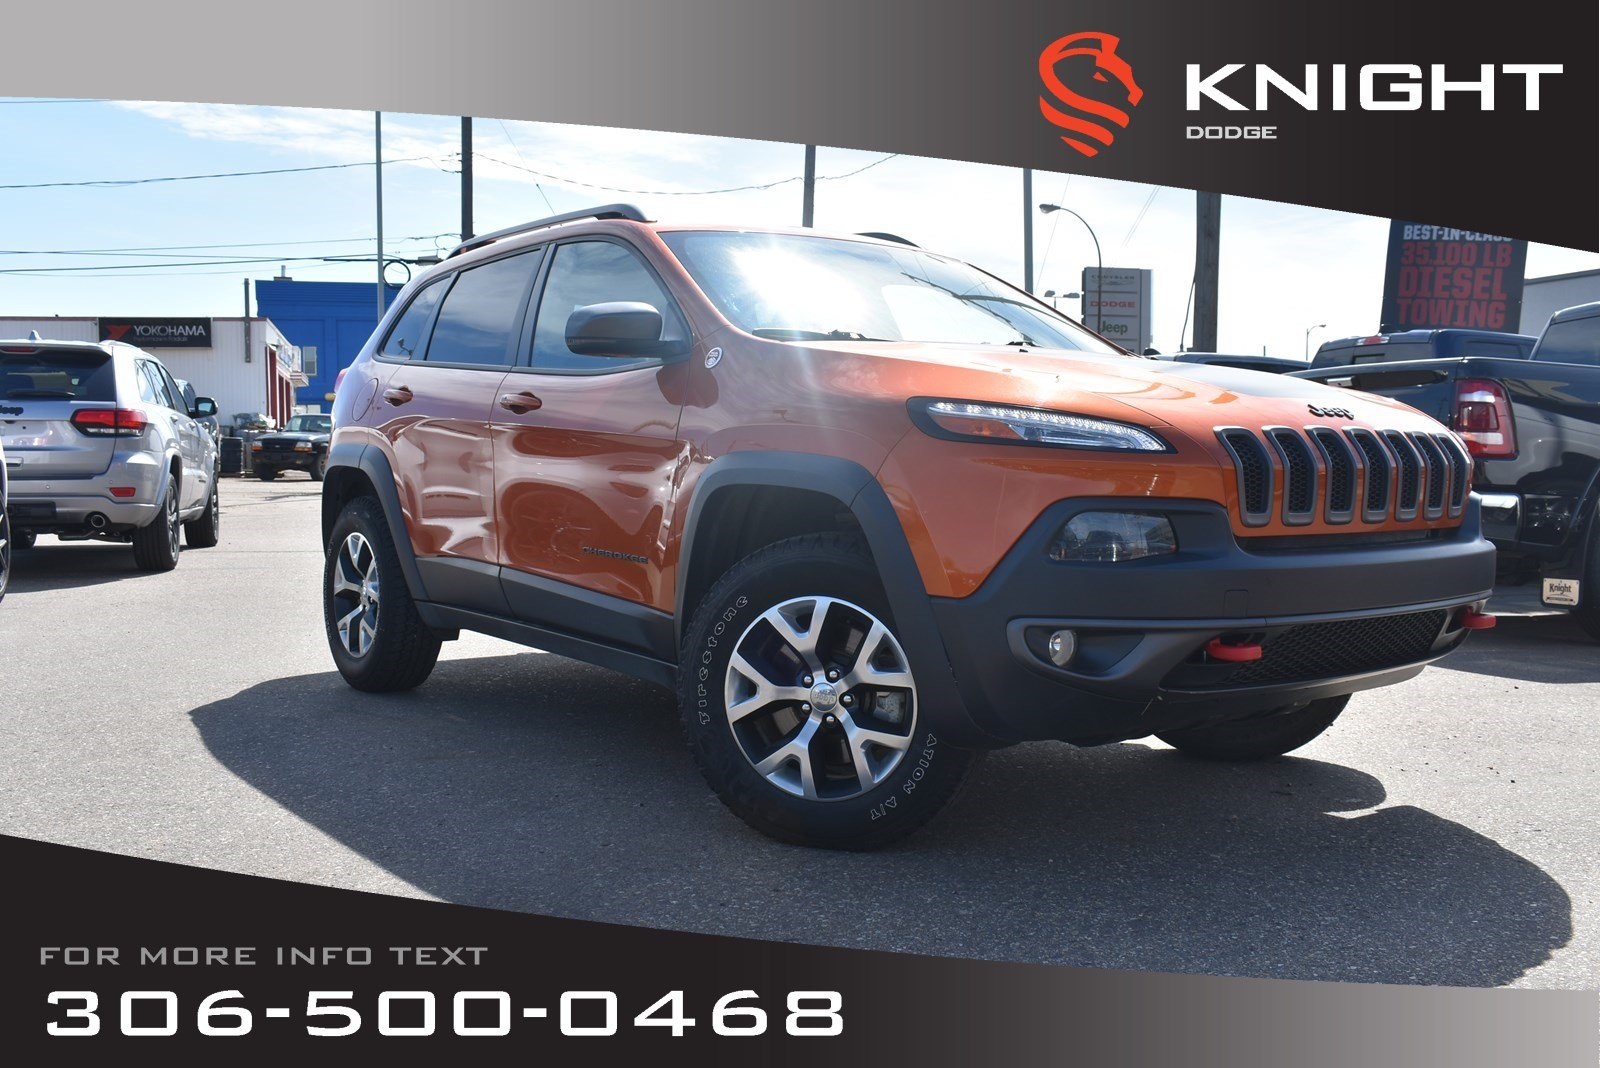 2015 Jeep Cherokee Trailhawk | Leather | Heated Seats & Steering Whee 4WD  Trailhawk